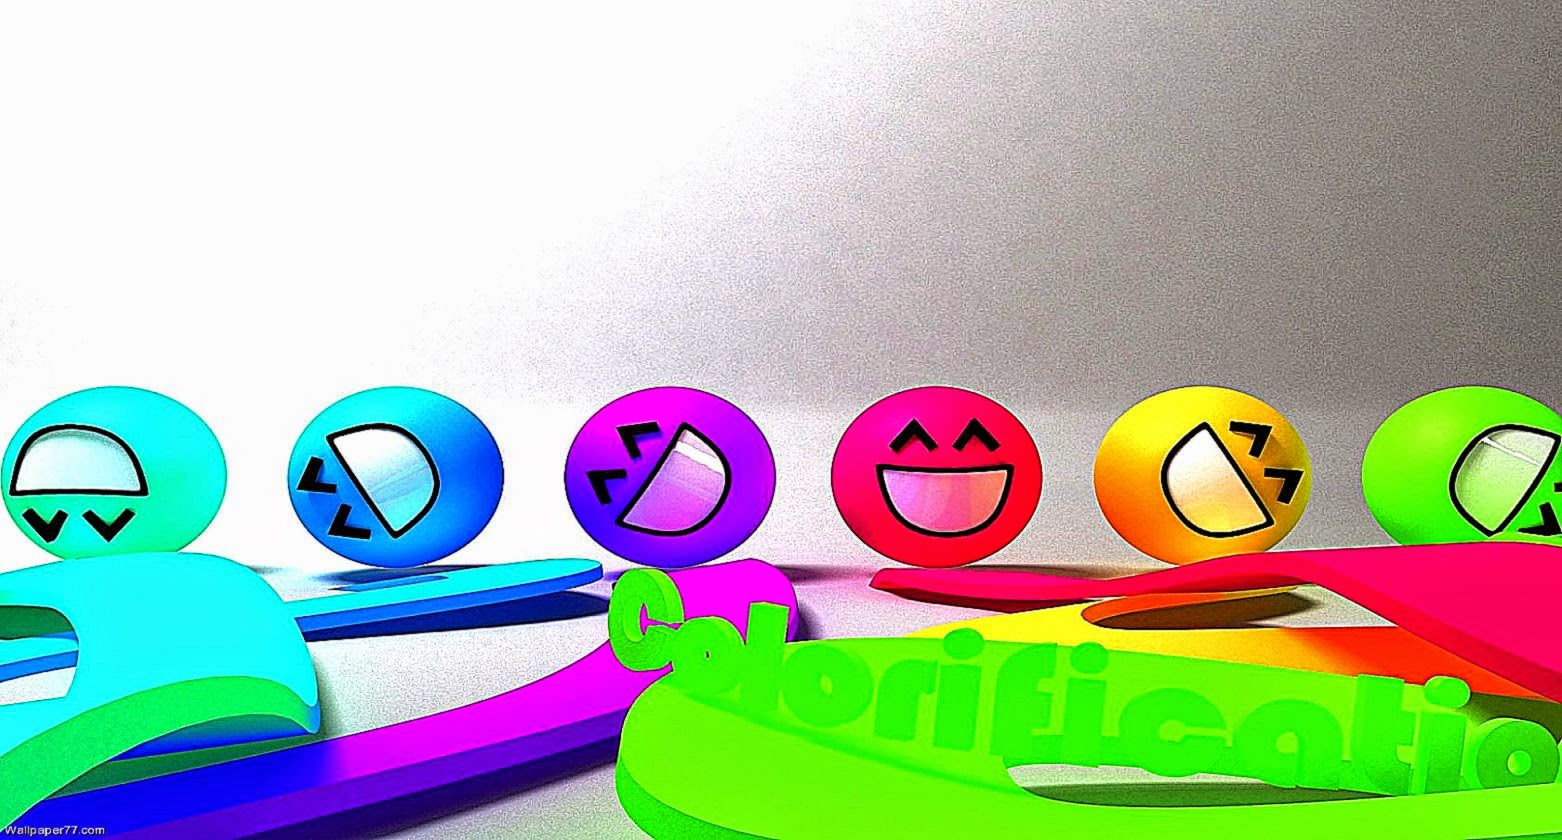 all about hd wallpaper cute emoticon colorful wallpaper hd